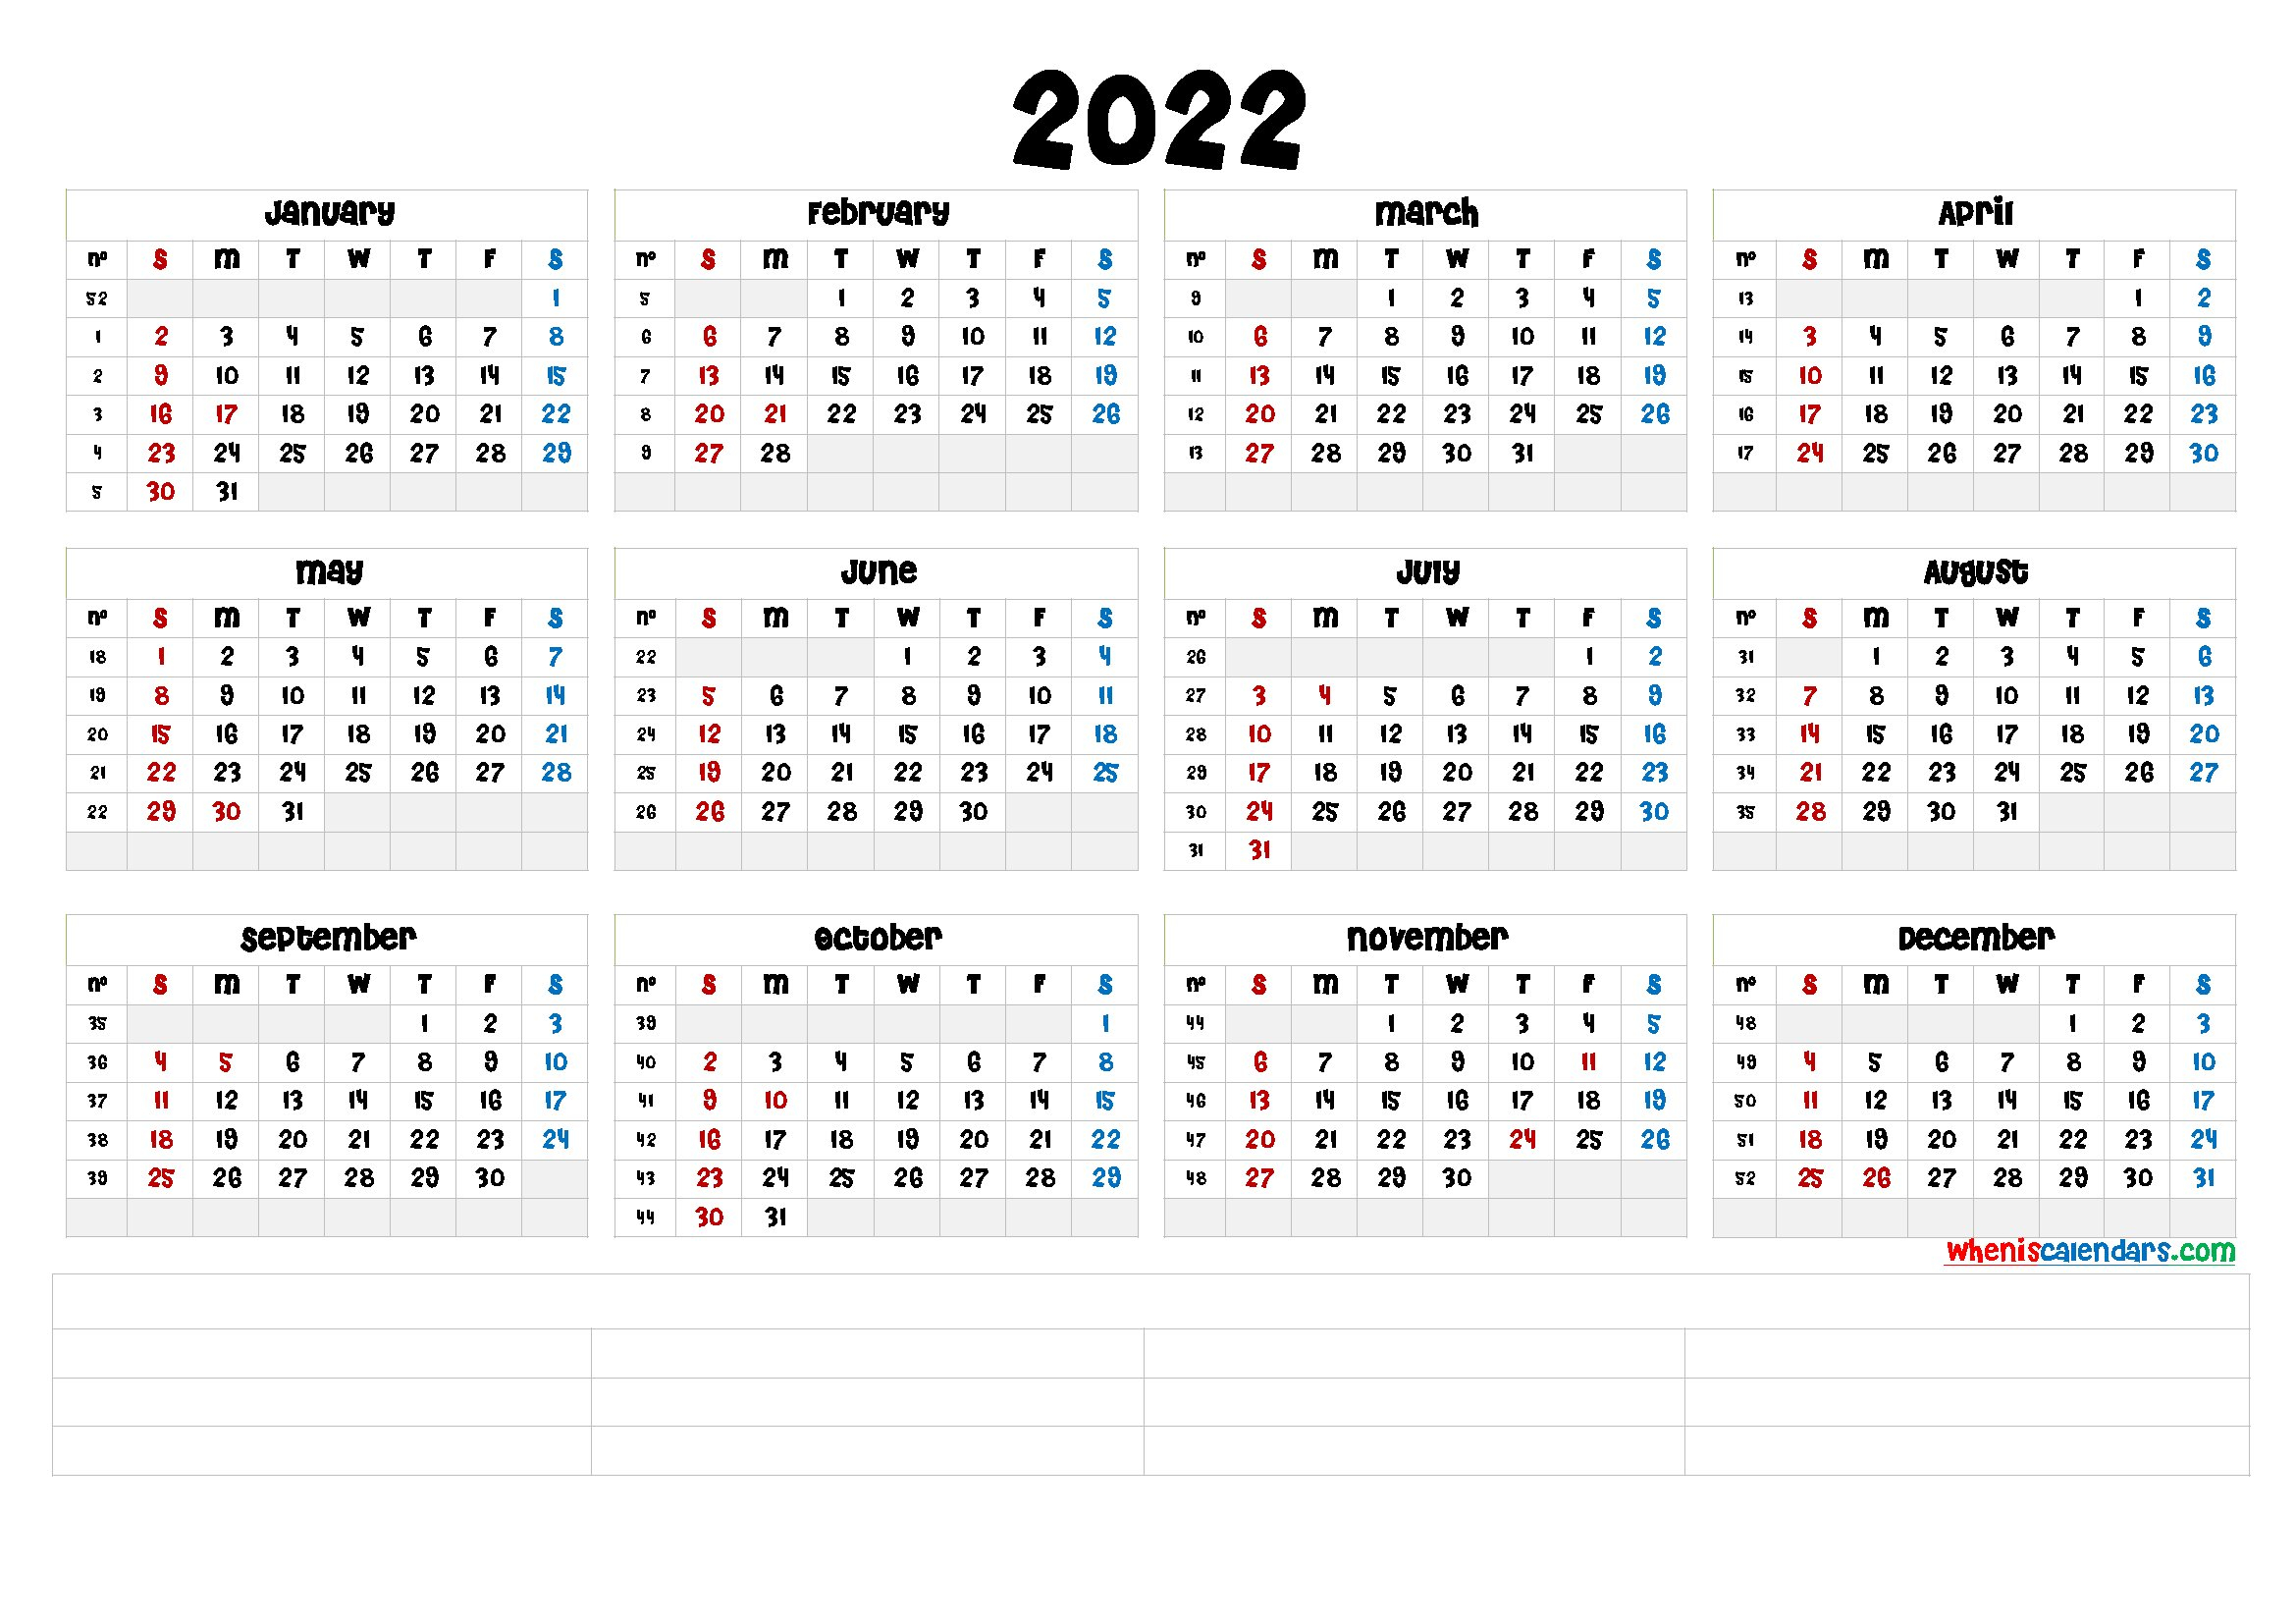 Free Printable 2022 Calendarmonth (6 Templates) - Free for Free Printable 2022 September Calendar Image